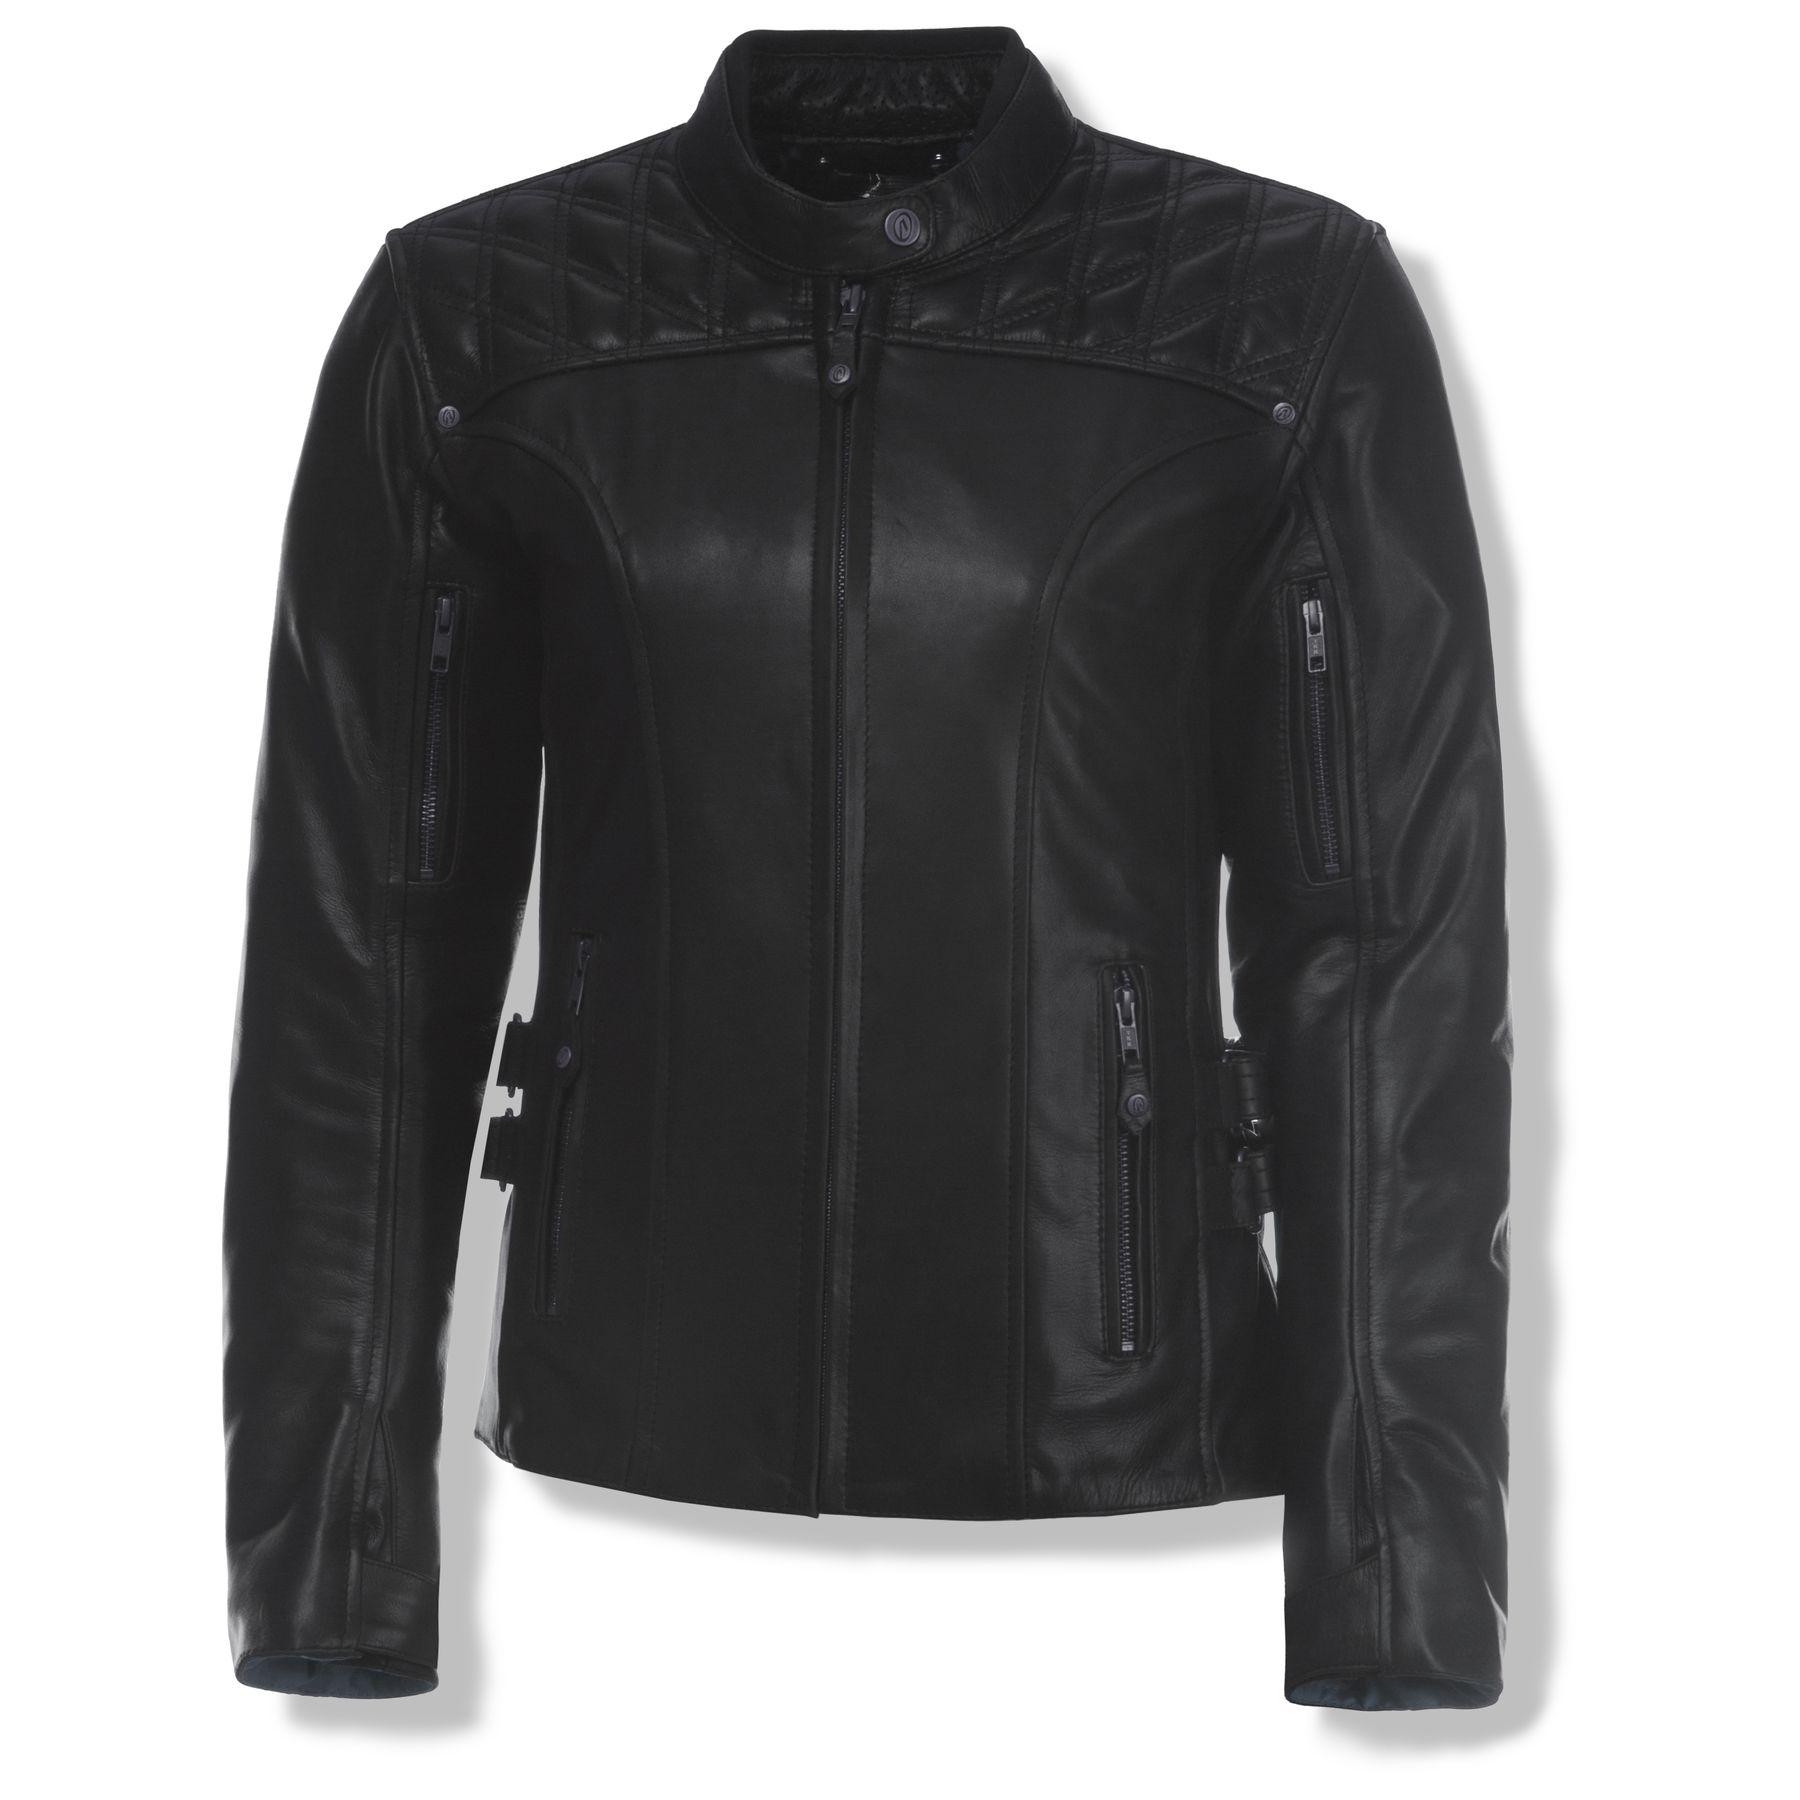 884b287076c282 Olympia Janis Women s Leather Jacket - MX Alliance